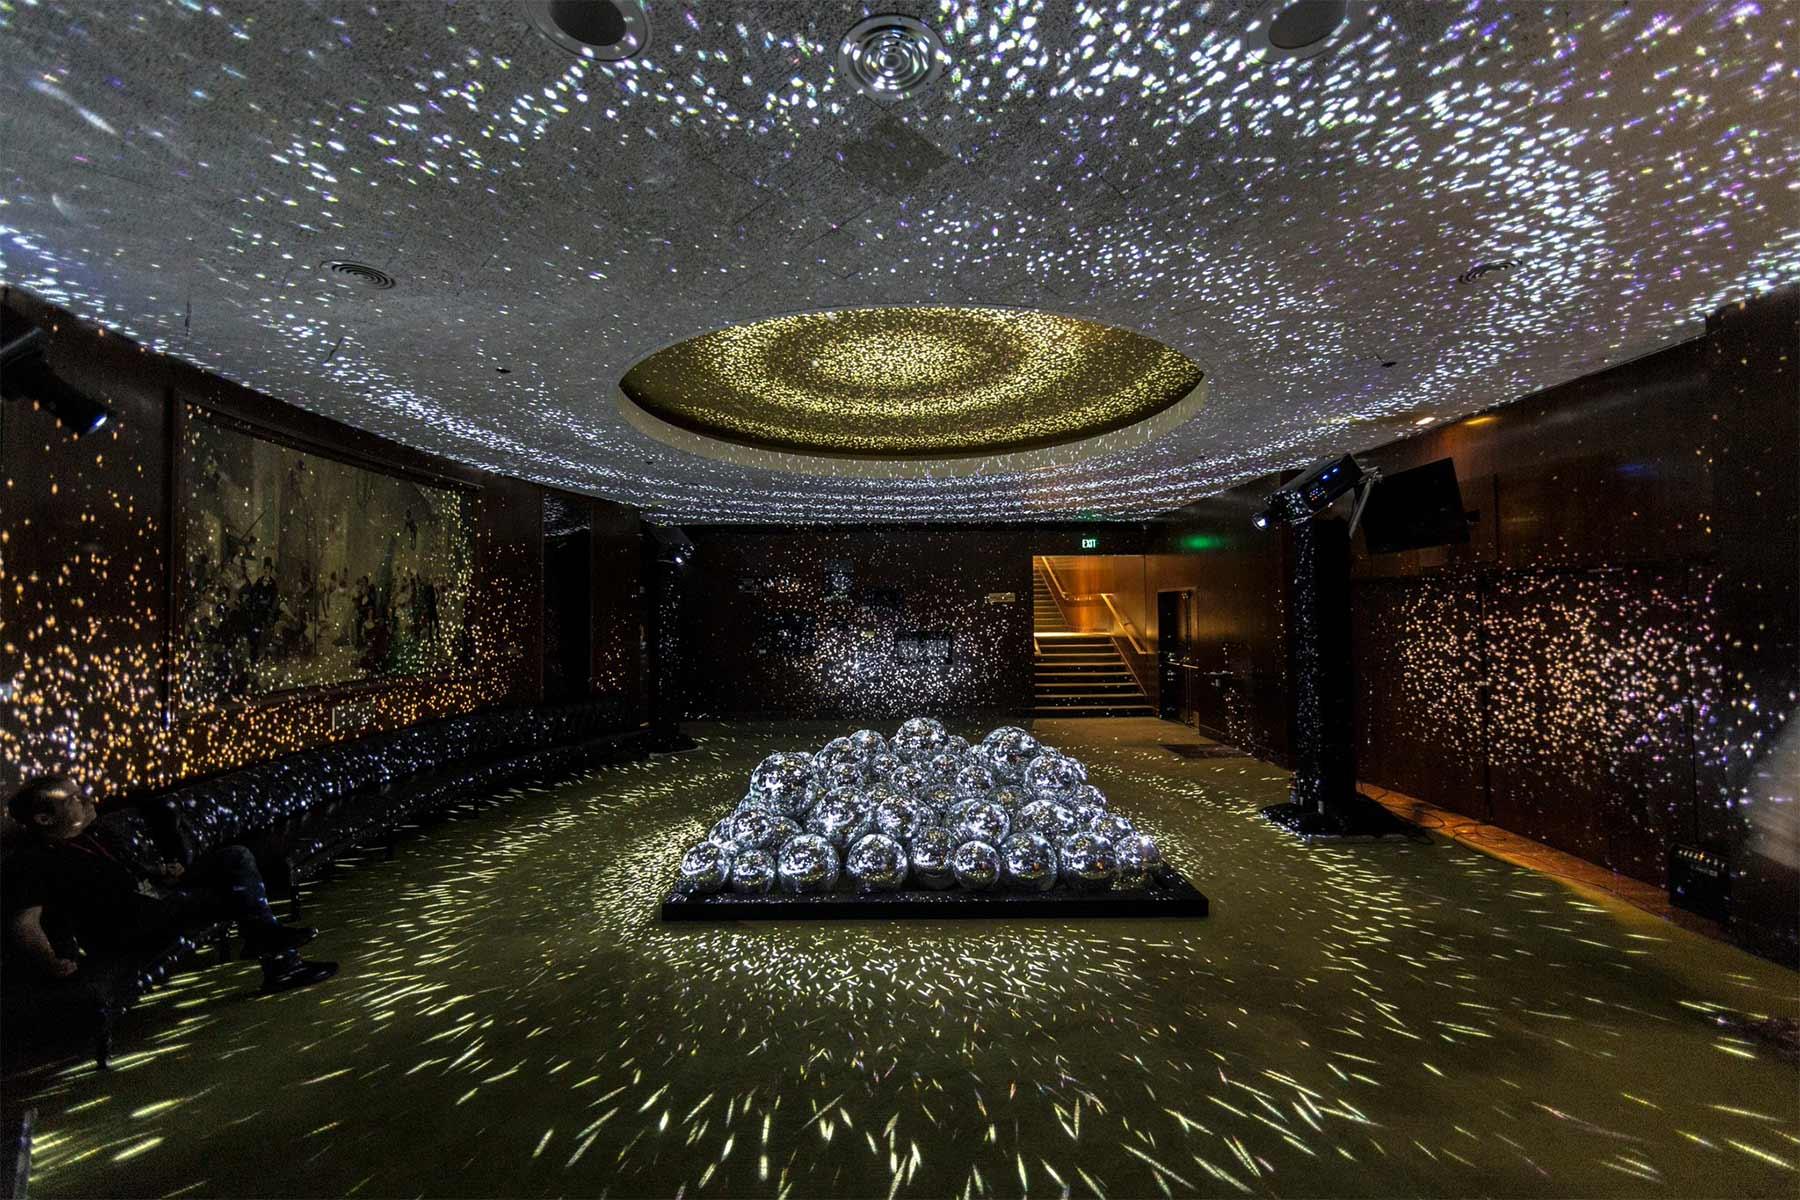 50 Discokugeln in einem Raum light-leaks-discokugeln_01